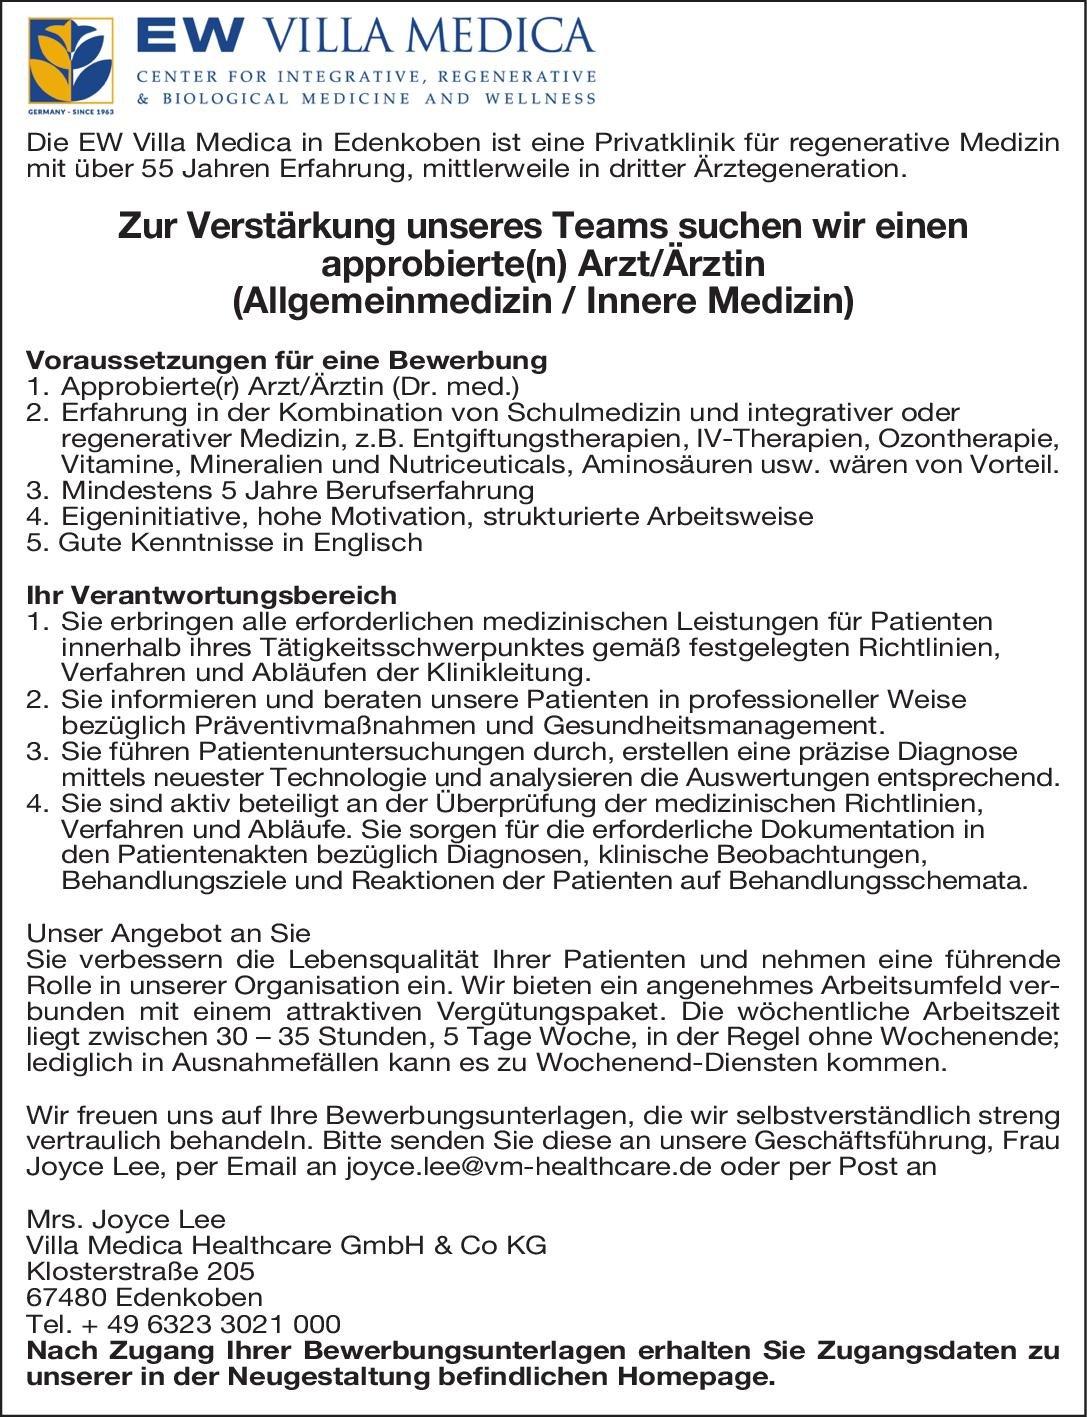 Villa Medica Healthcare GmbH & Co KG Arzt/Ärztin (Allgemeinmedizin / Innere Medizin)  Innere Medizin, Allgemeinmedizin, Innere Medizin Arzt / Facharzt